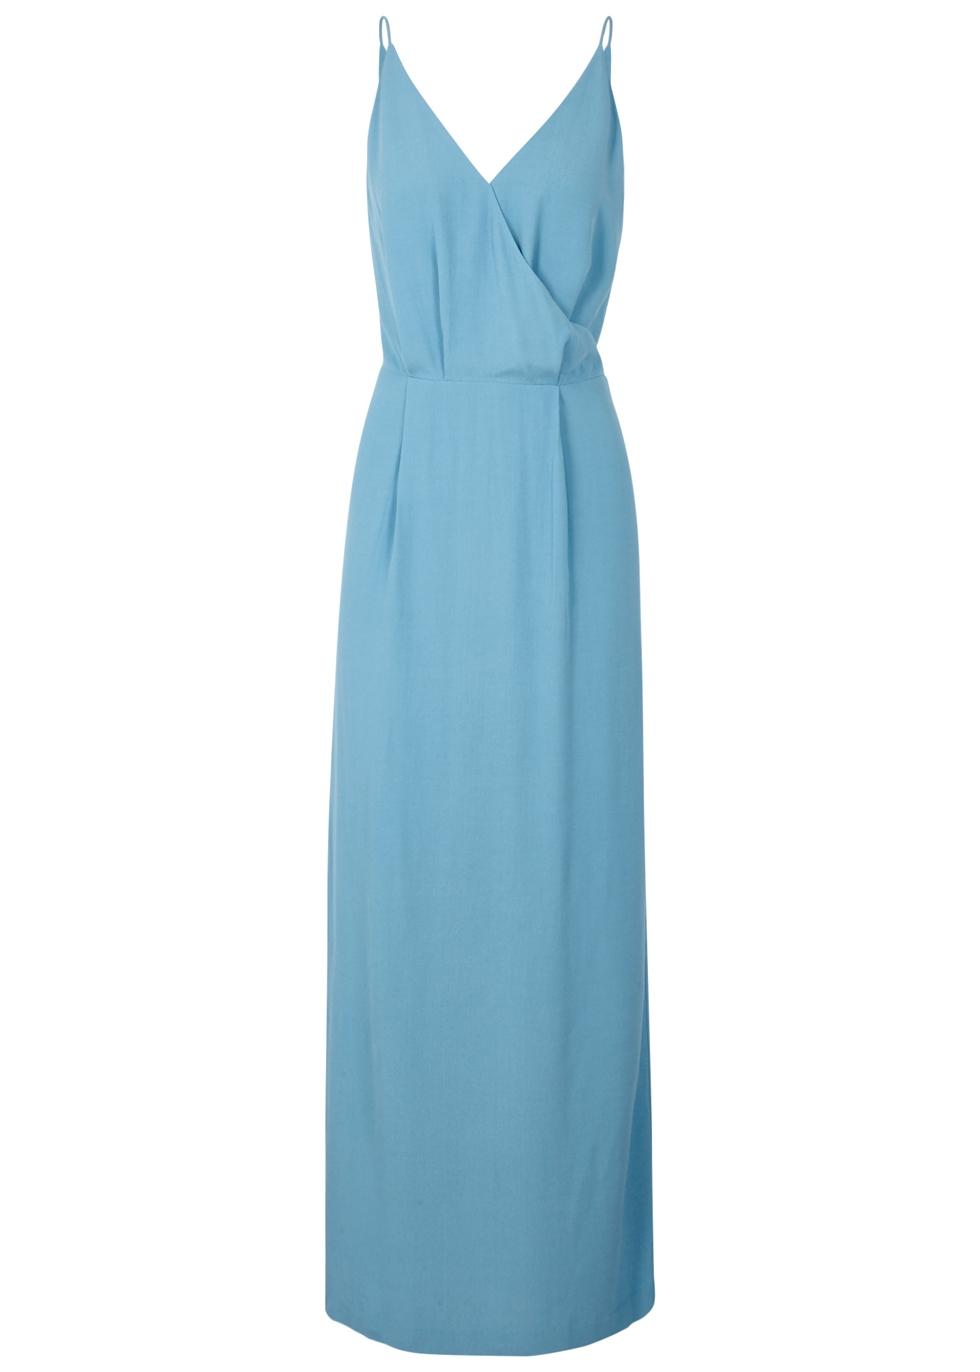 SAMS0E & SAMS0E Ginni Lace-Back Maxi Dress in Blue